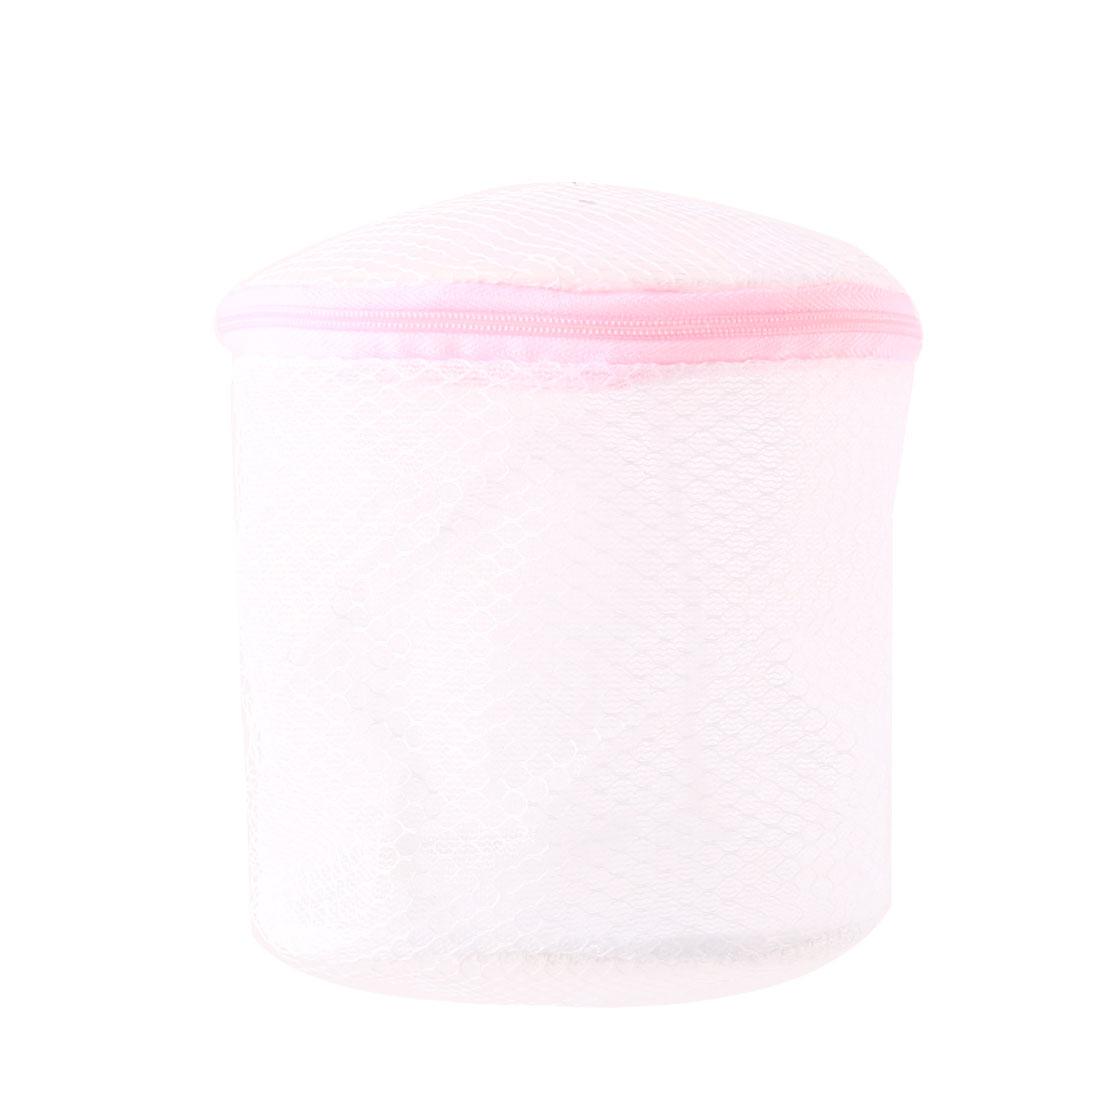 Household Laundry Nylon Underwear Bra Stockings Meshy Zippered Washing Bag